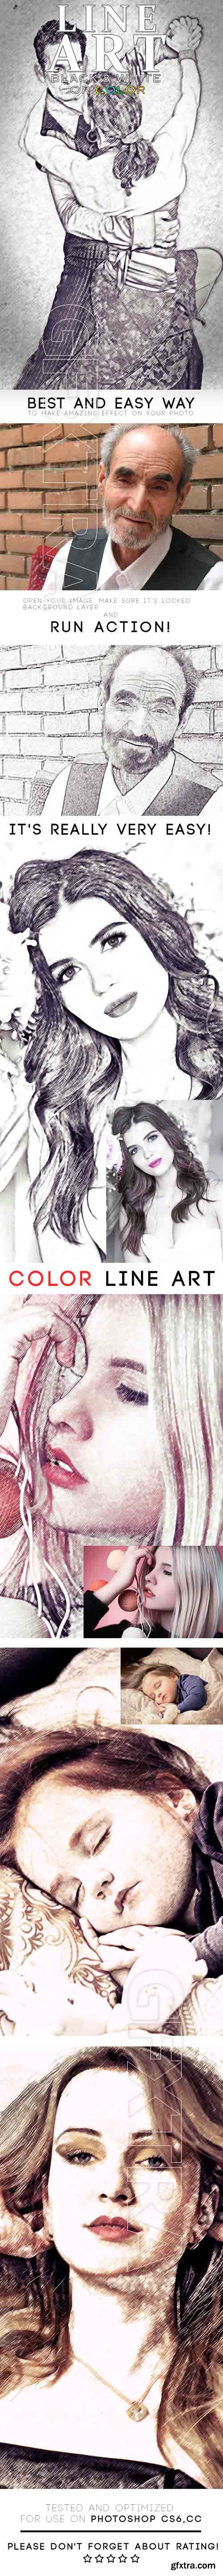 GraphicRiver - Line Art Action 20470548